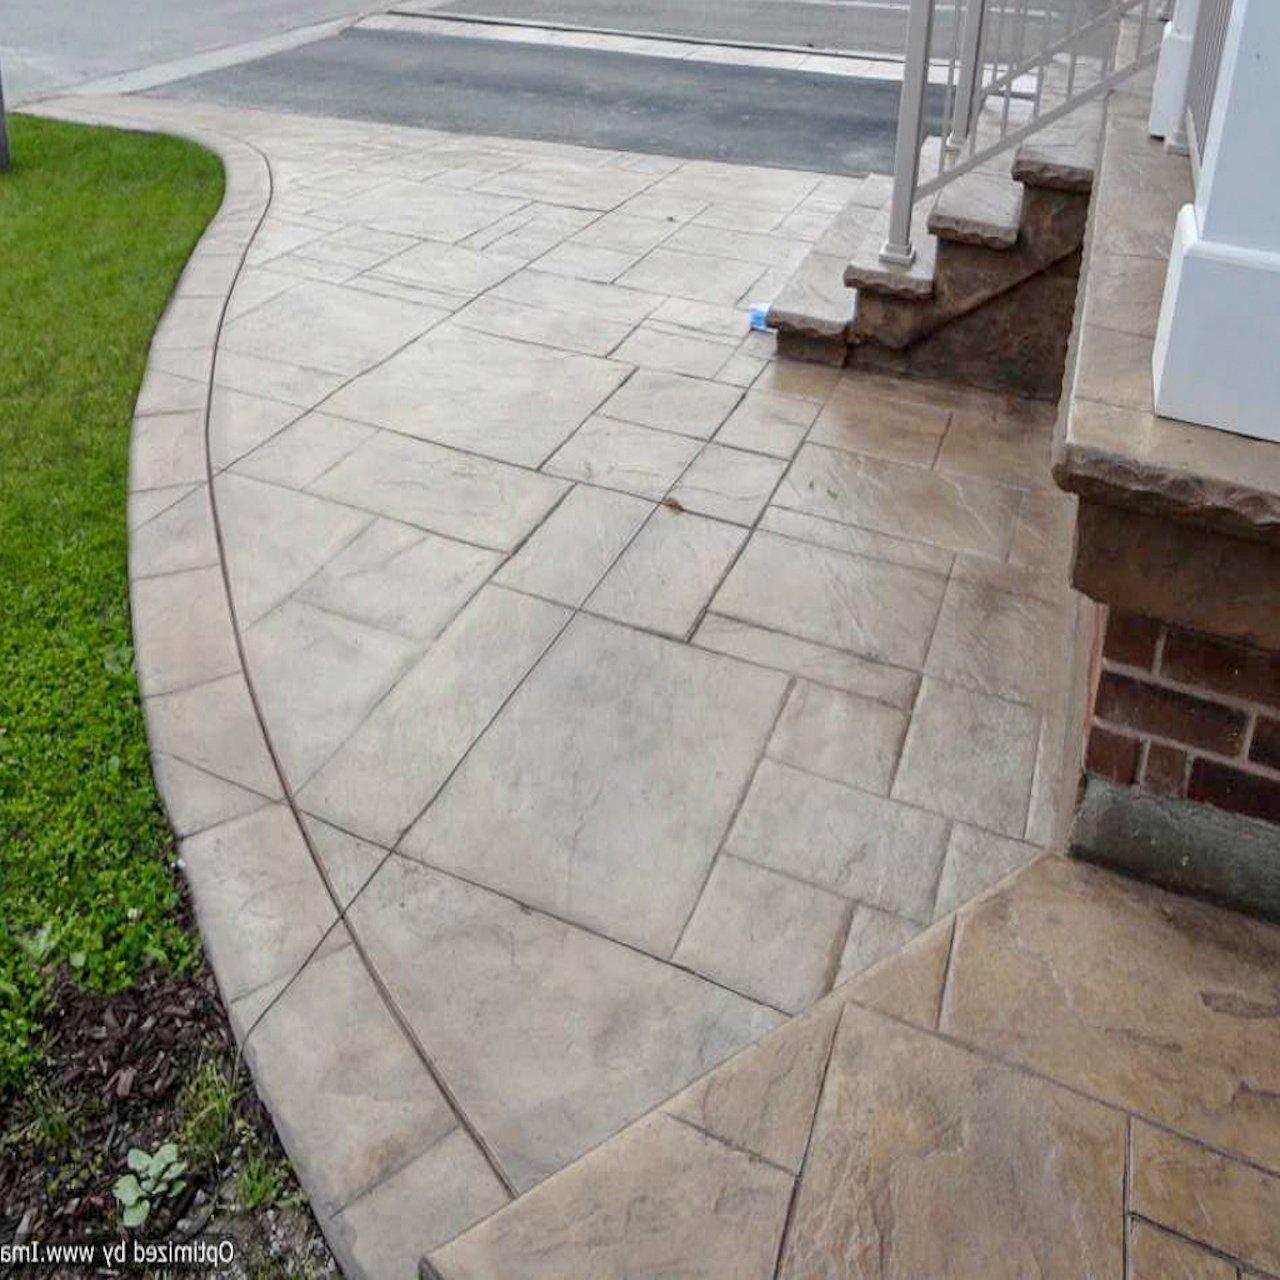 DecoMax Concrete - Concrete Walkways Gallery - 09